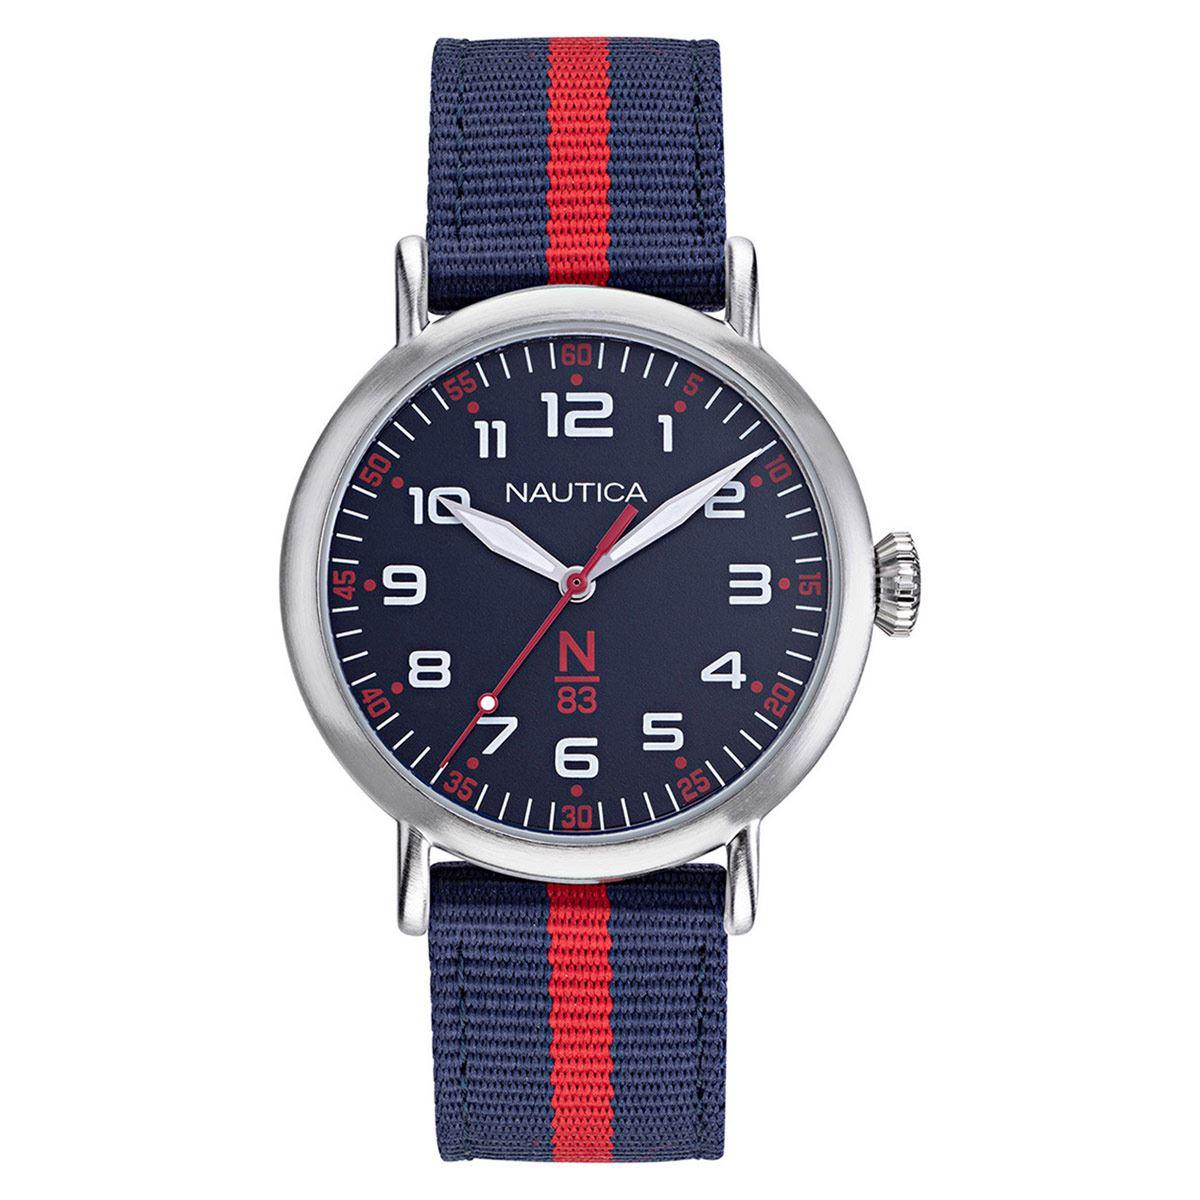 Reloj N83 Azul Navy NAPWLF922 Para Caballero